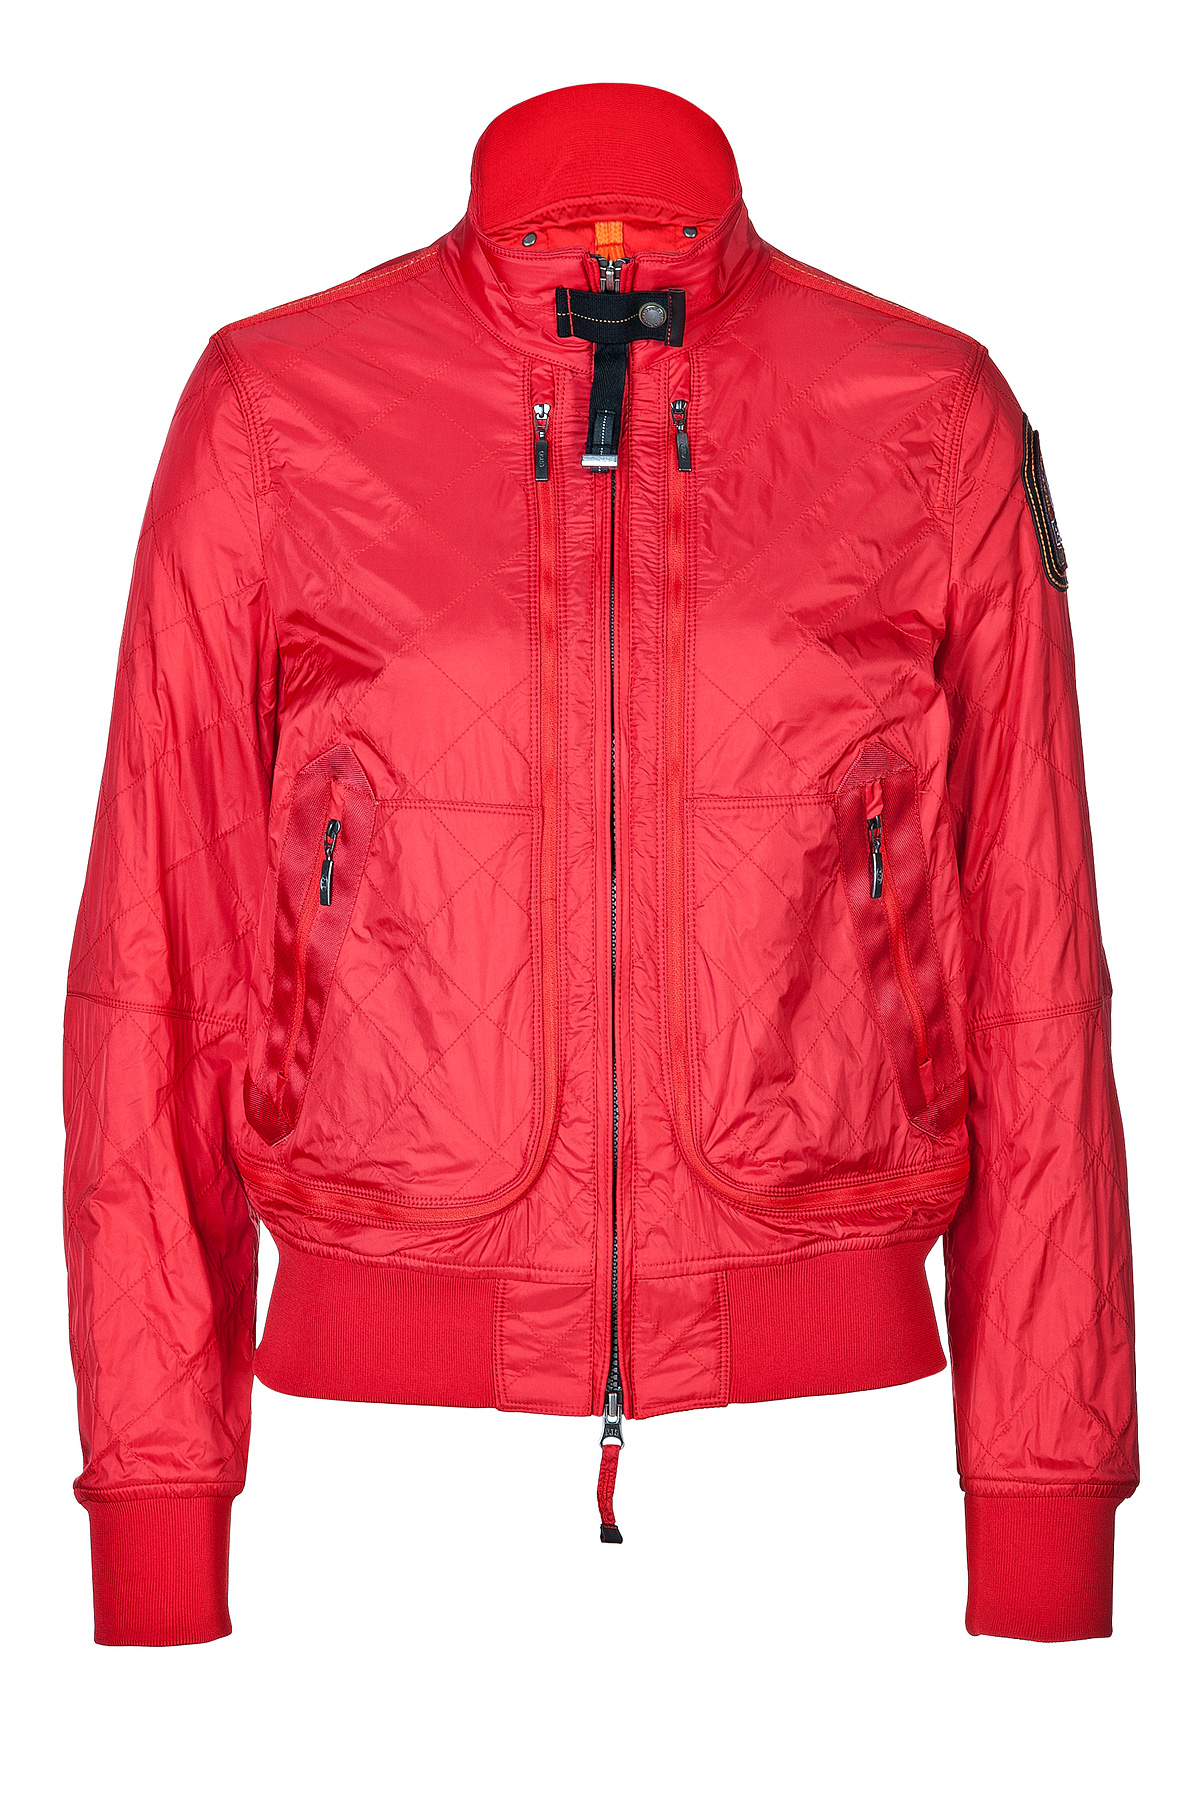 Lyst Parajumpers Gesteppte Daunenjacke Newport In Red